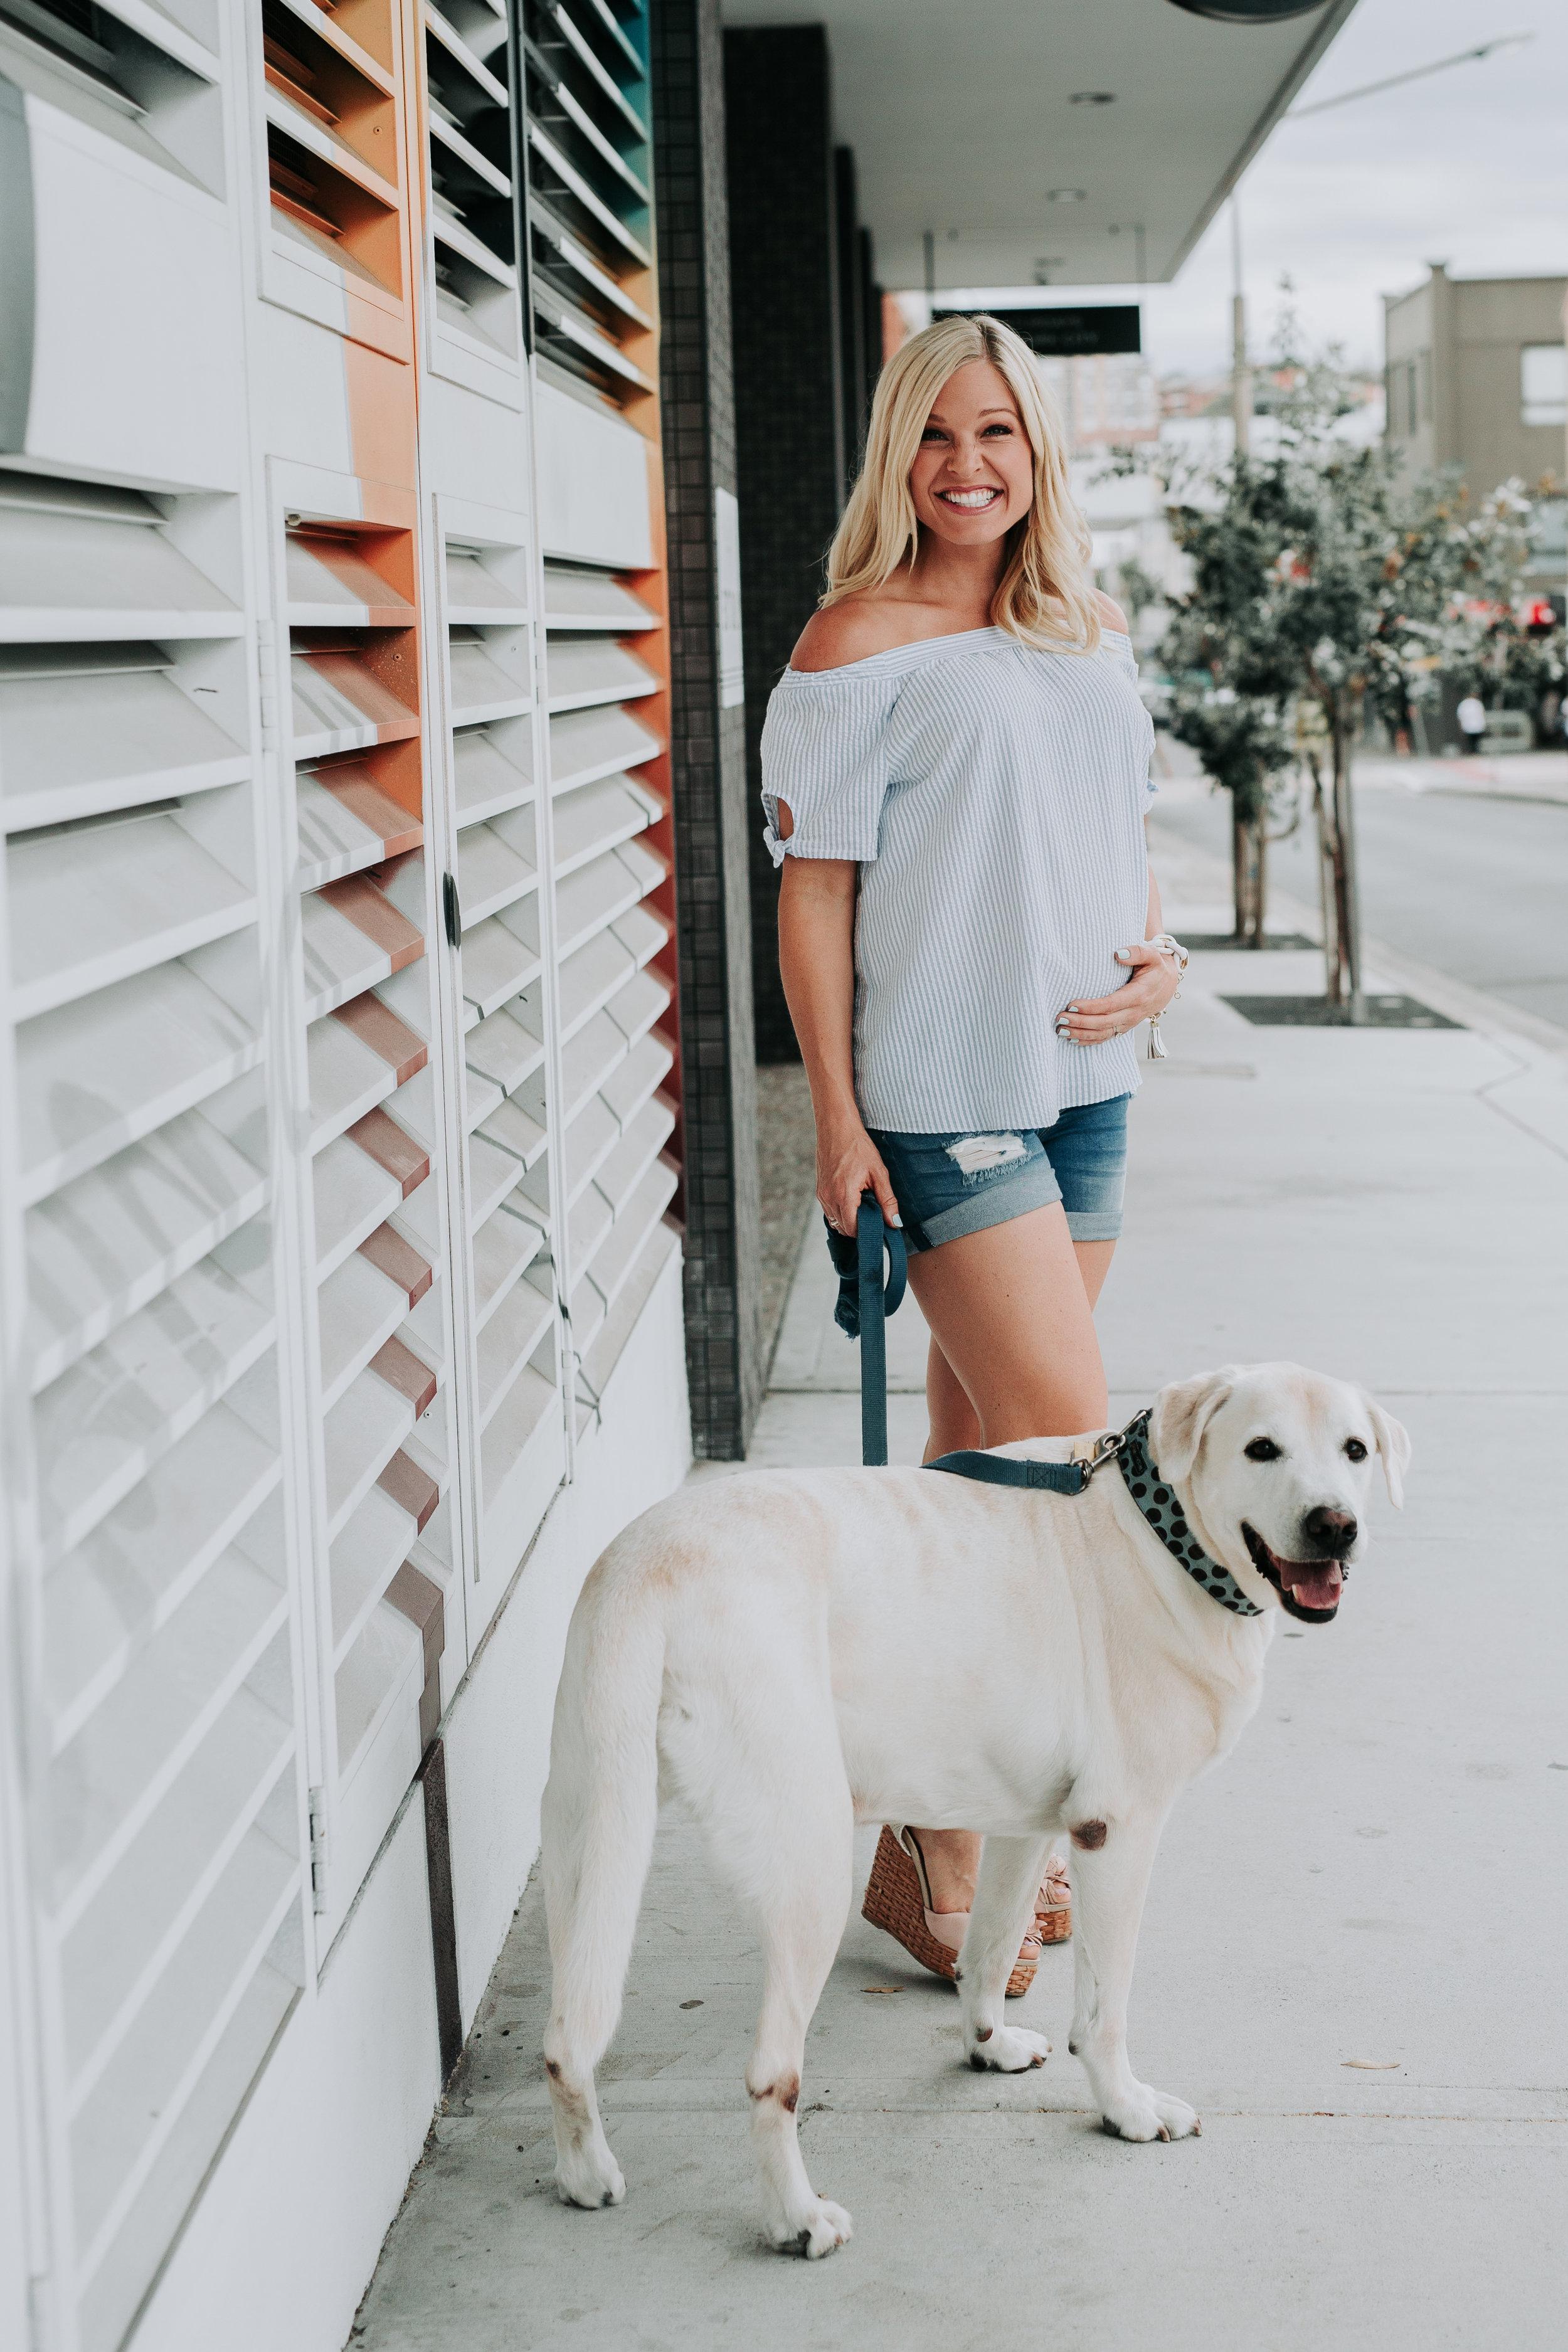 Anna Kooiman annakooiman.com fitness travel lifestyle pregnancy fashion style australia usa new york charlotte la los angeles nyc nc north carolina